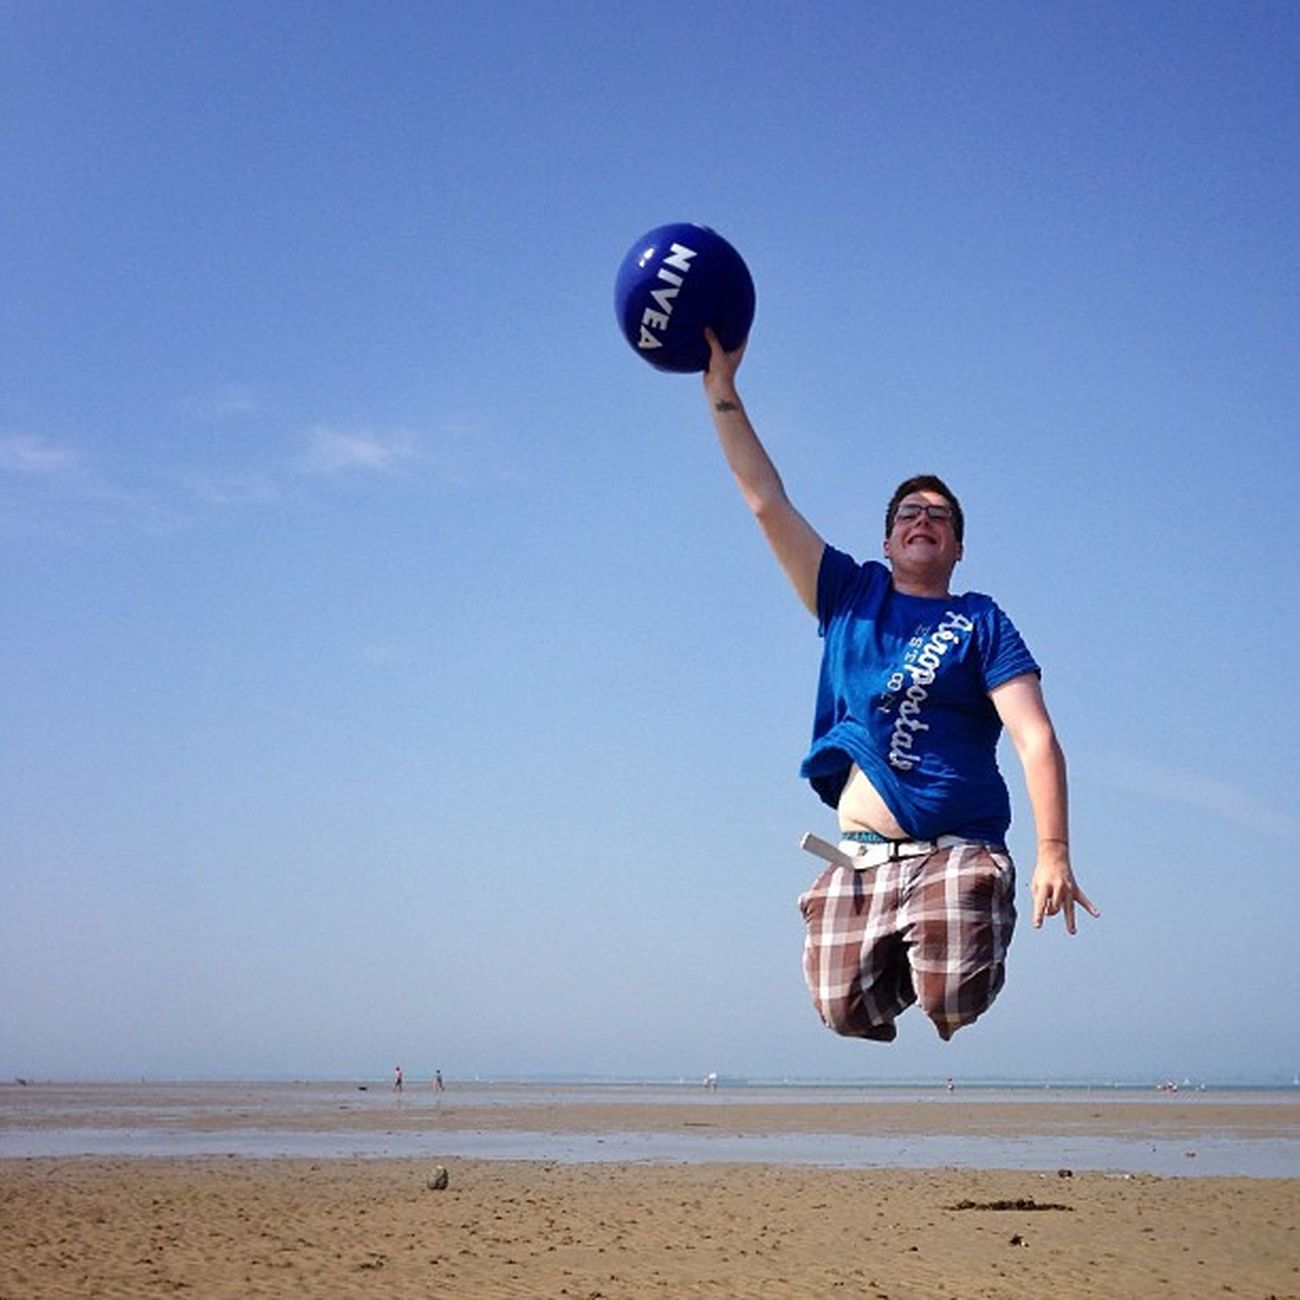 We had great fun on #rydebeach ? flying keith4594 #jump #IsleOfWight #aauk #allshots_ #sea #britishsummer #capture_today #englishchannel #gi_uk #gf_uk #gang_family #ig_england #o2travel #summer #YourTurnBritain #royalisland Capture_today Yourturnbritain Summer Englishchannel Sea Isleofwight Royalisland Jump Rydebeach Gang_family Kewikihighlight_action Britishsummer Allshots_ Gf_uk O2travel Gi_uk Ig_england Aauk